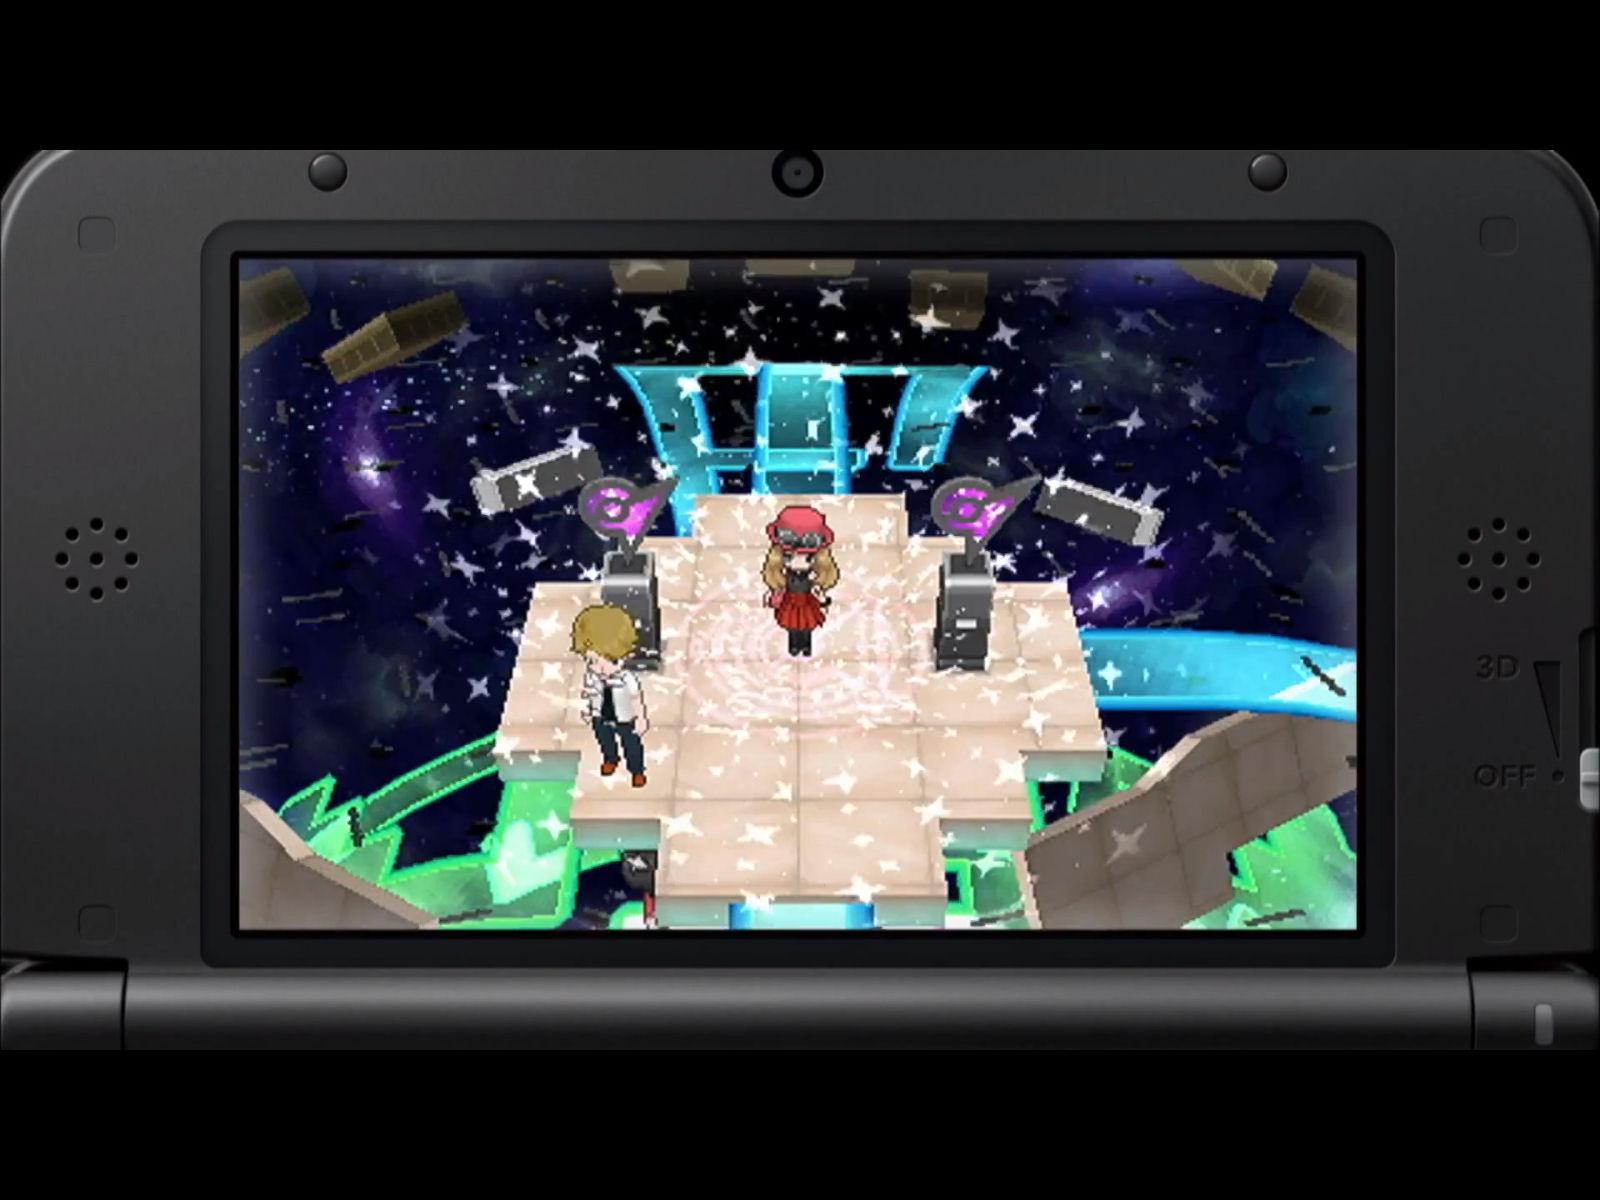 Pokemon X and Y Psychic Gym Screenshot